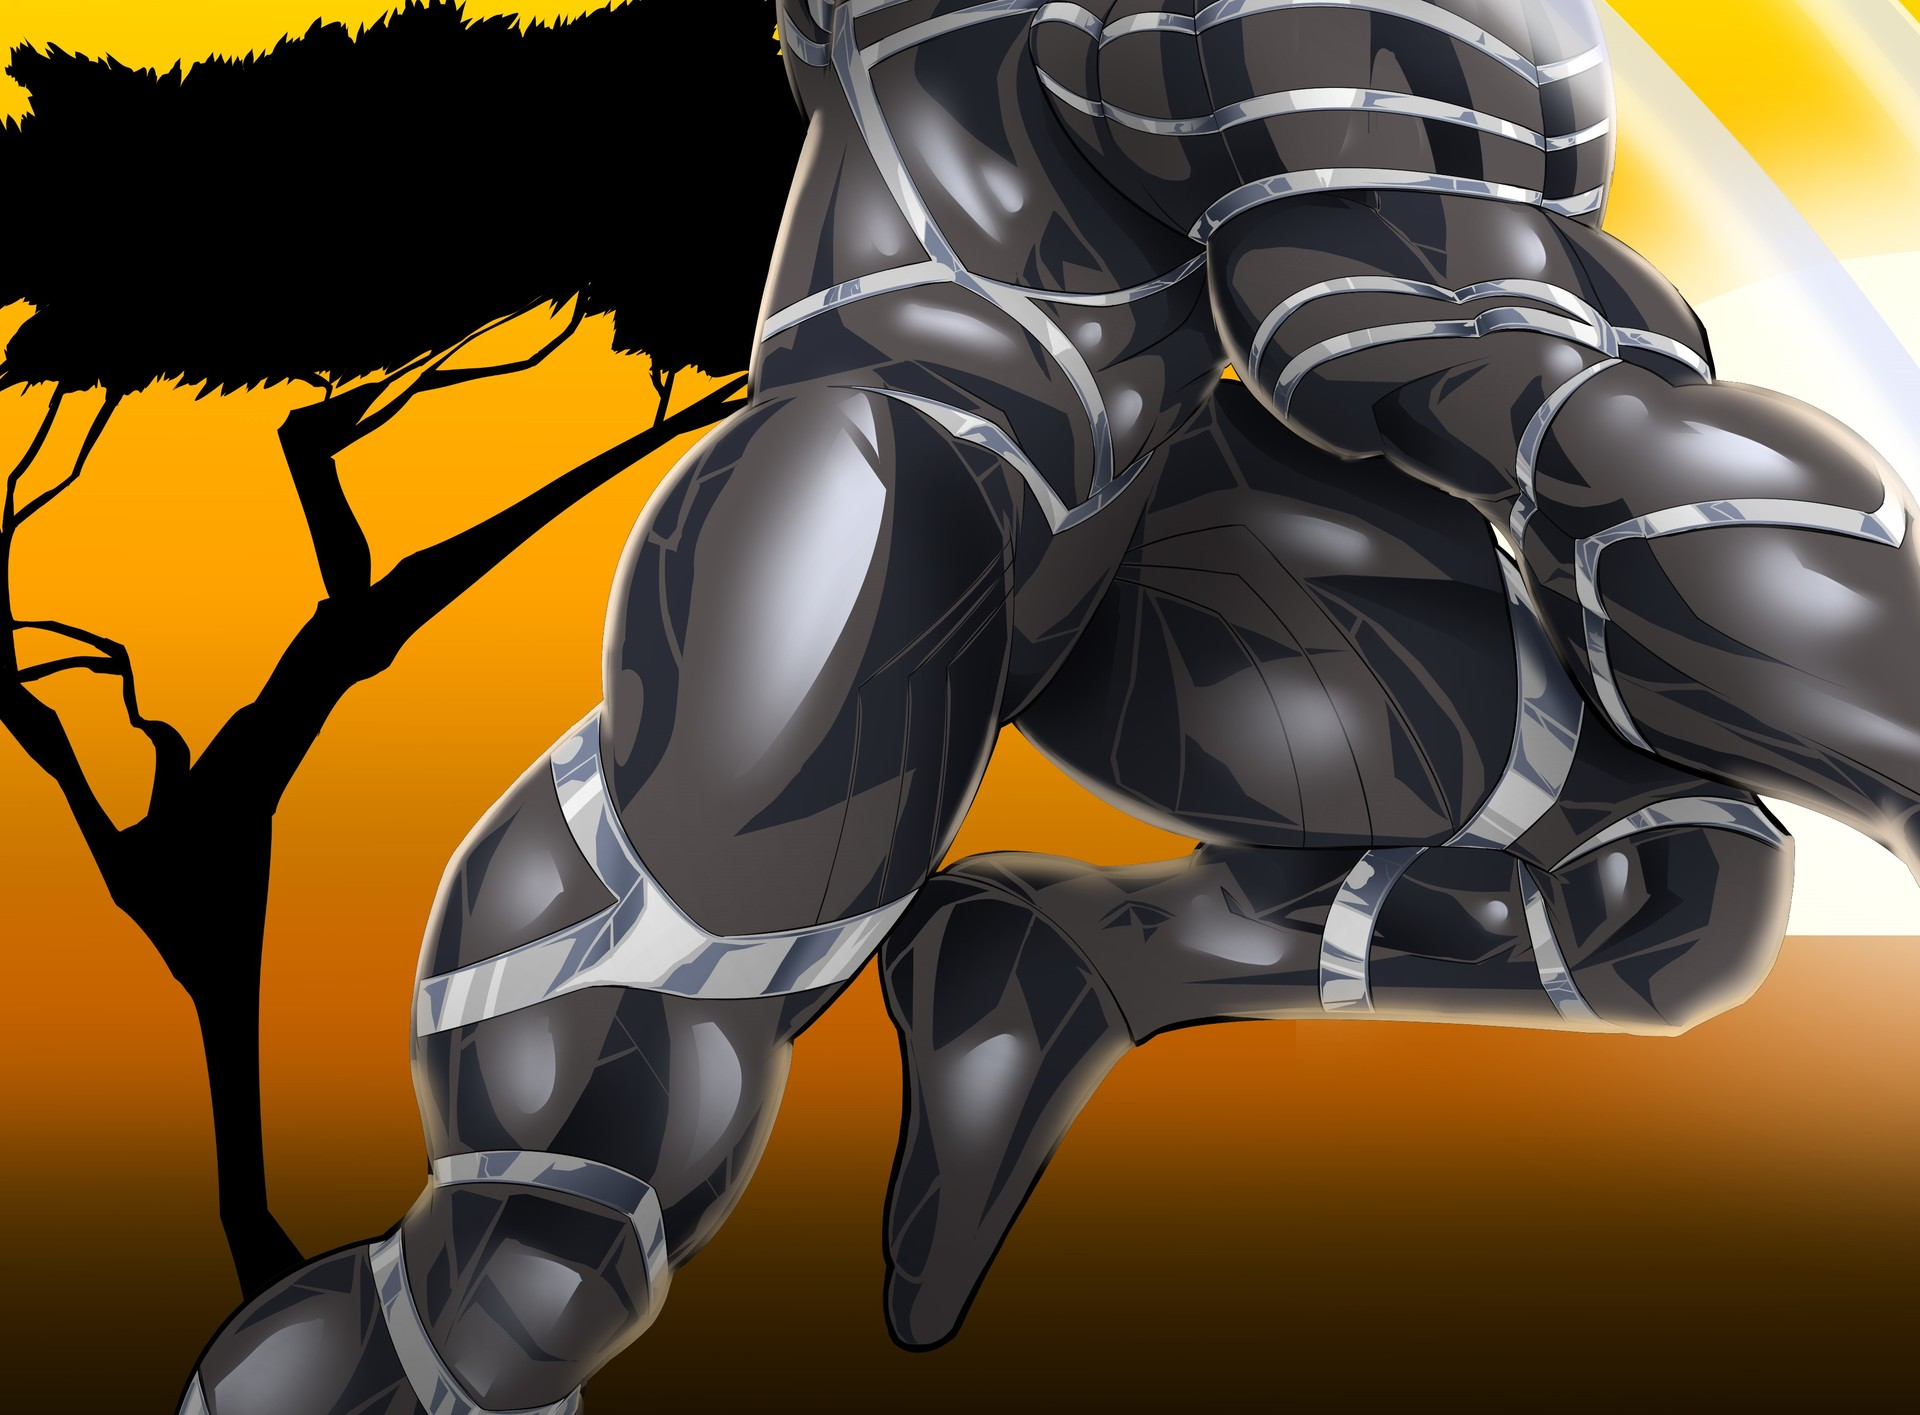 Robert e wilson black panther 6